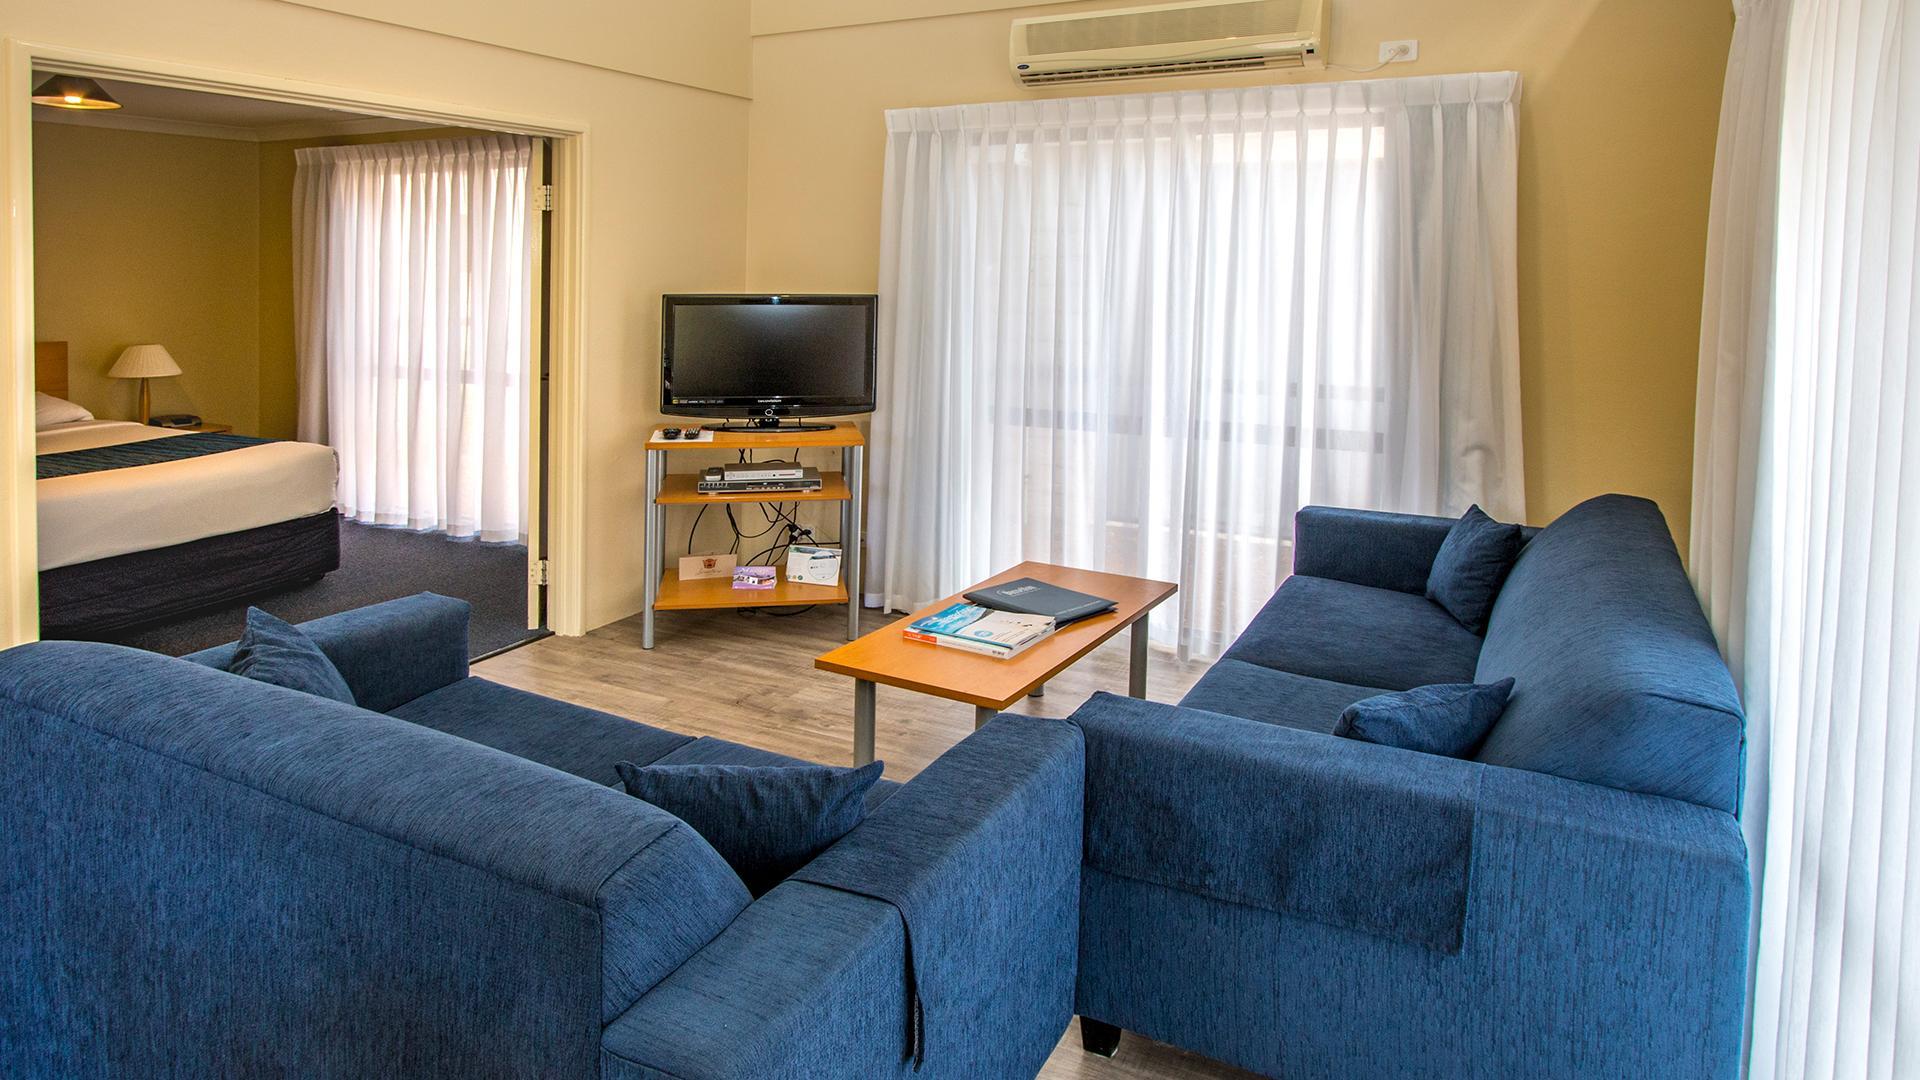 One-Bedroom Villa image 1 at Amalfi Resort Busselton by City of Busselton, Western Australia, Australia